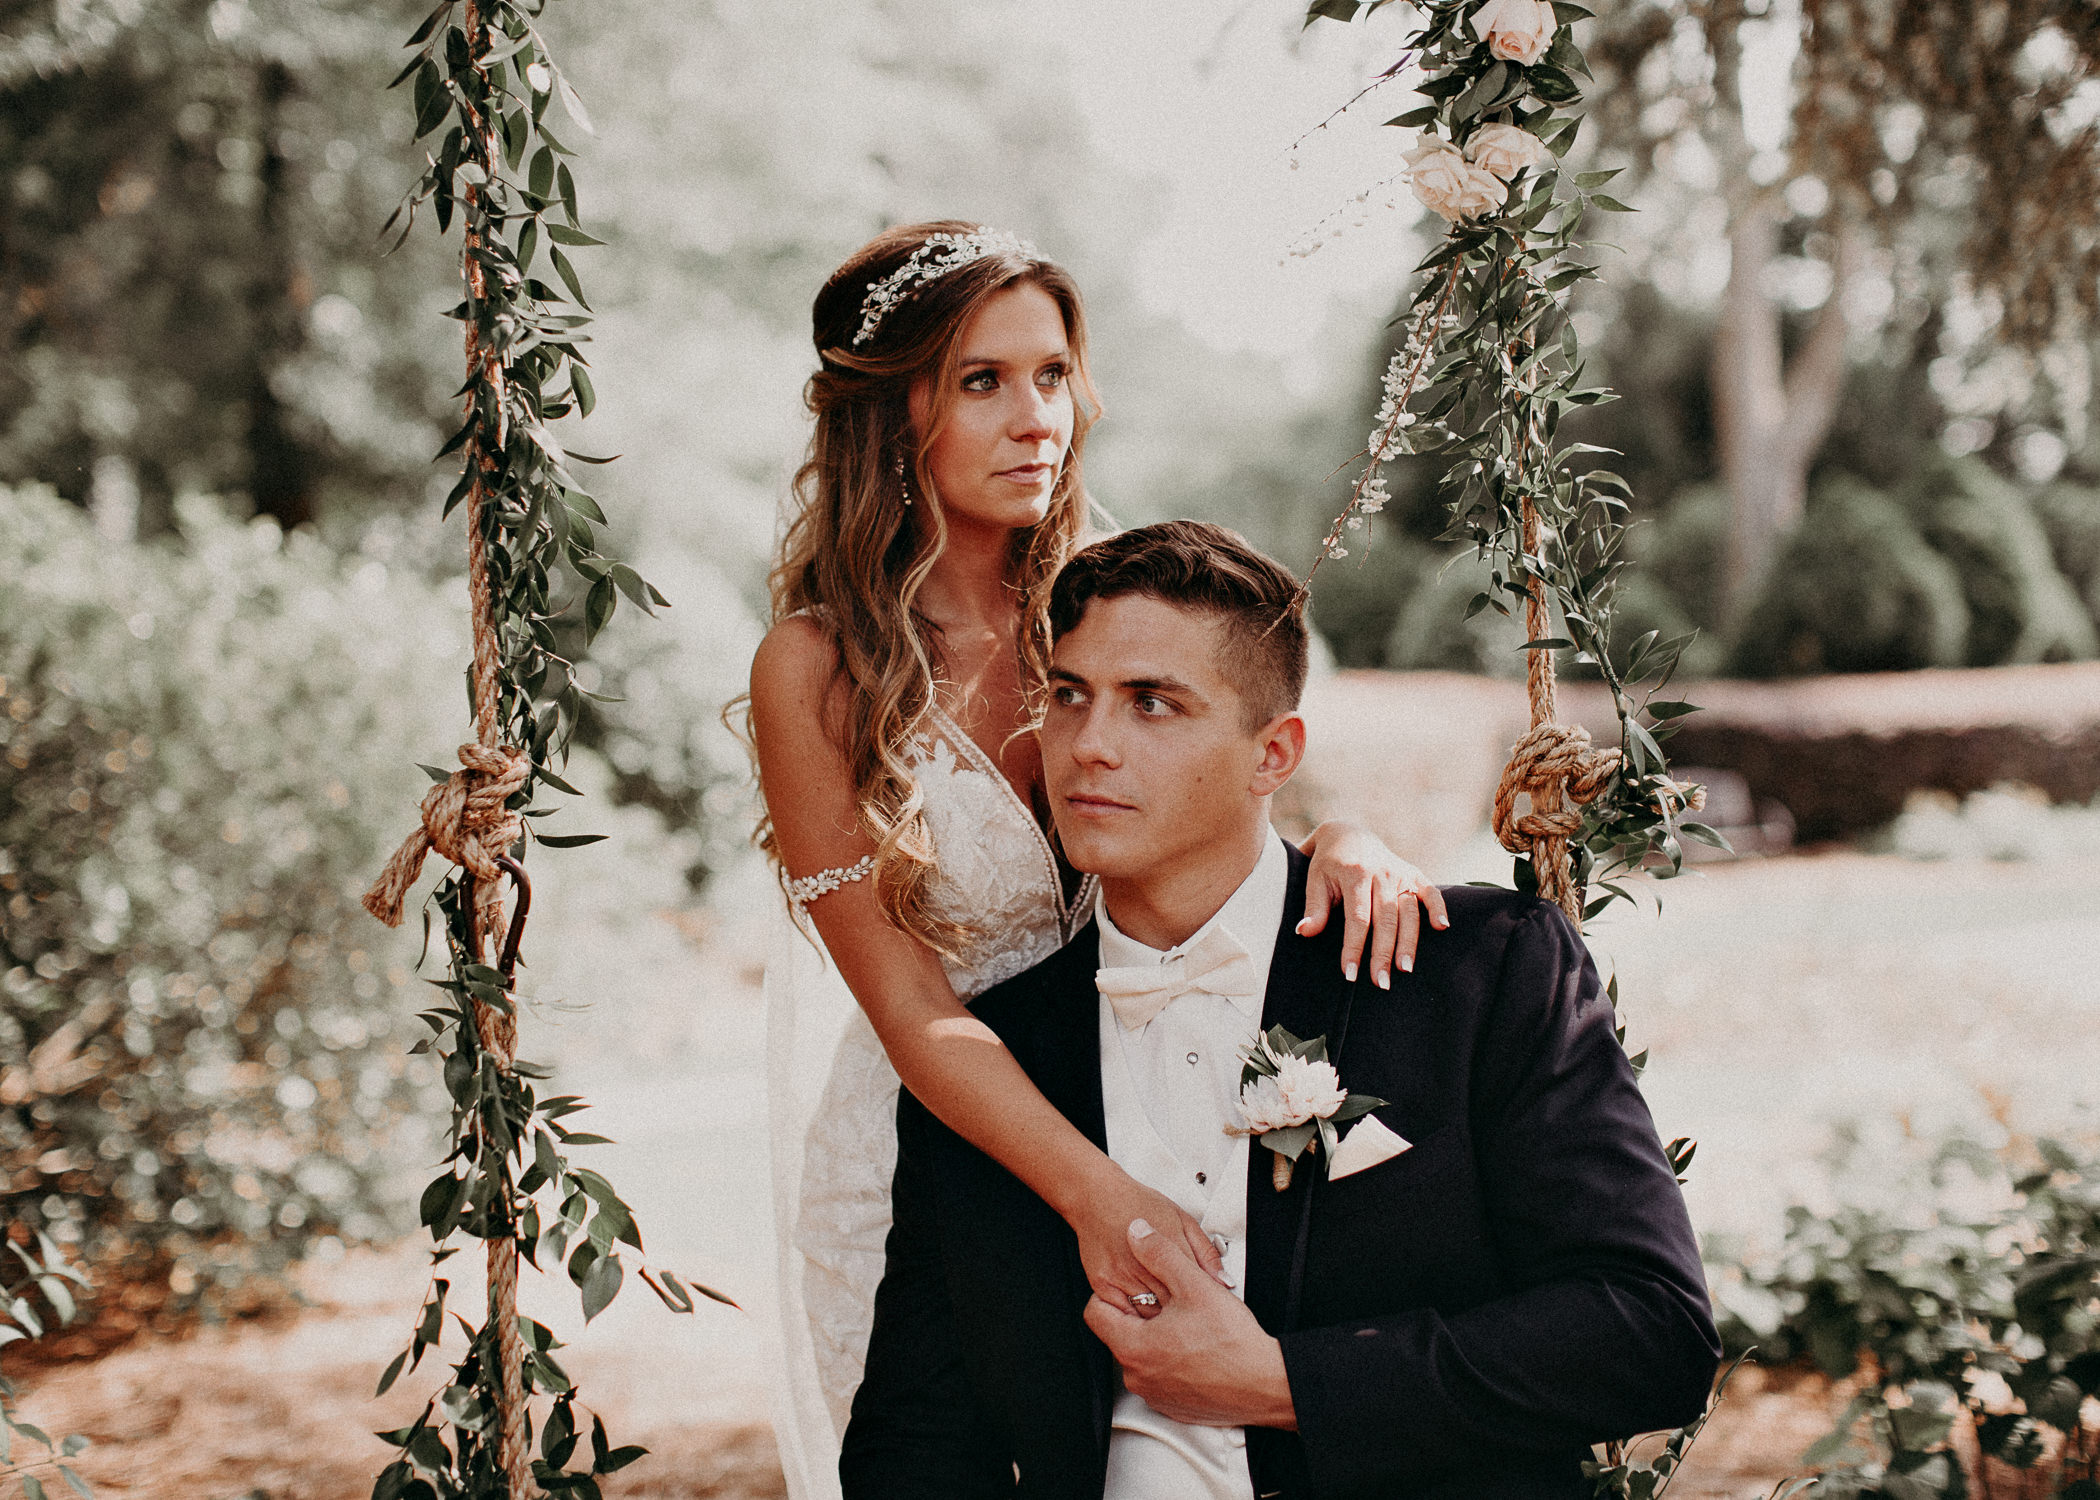 39Carl House Wedding Venue Ga, Atlanta Wedding Photographer - Boho, Bohemian, Junebug Weddings, Vintage, Retro, Trendy. Aline Marin Photography. .jpg